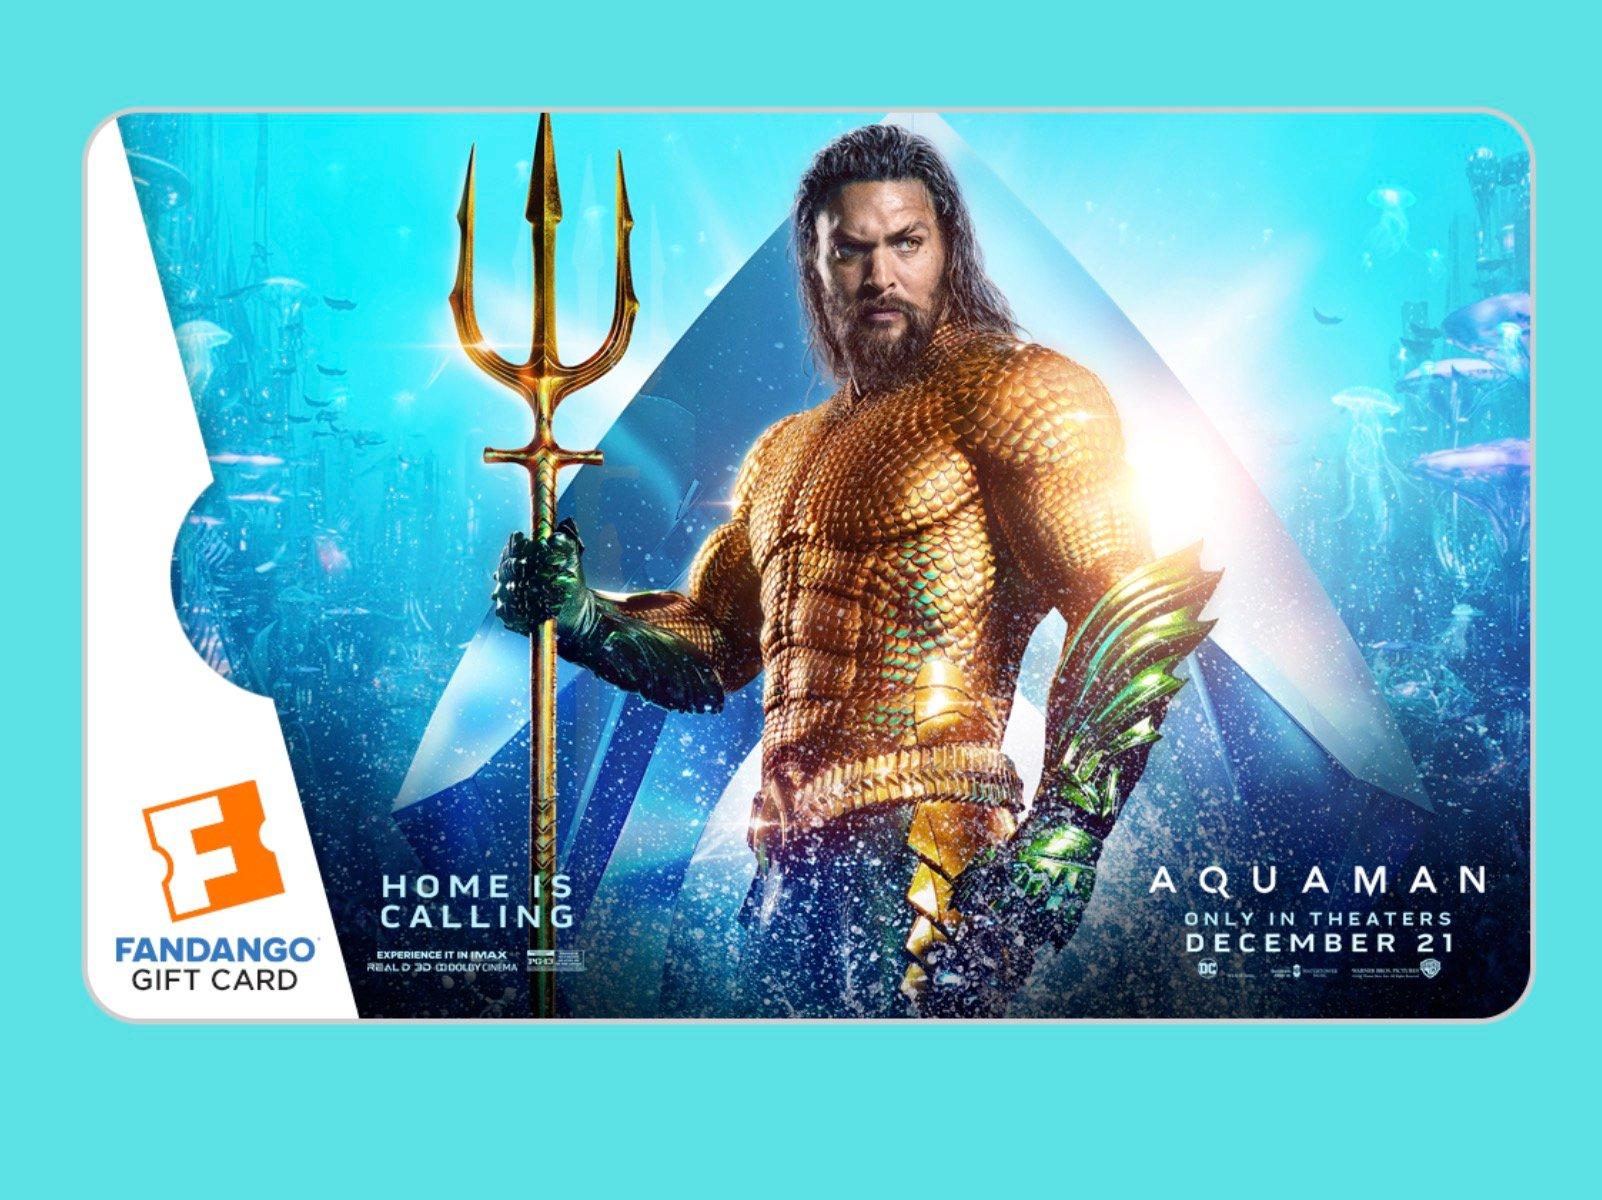 Fandango Aquaman Gift Card